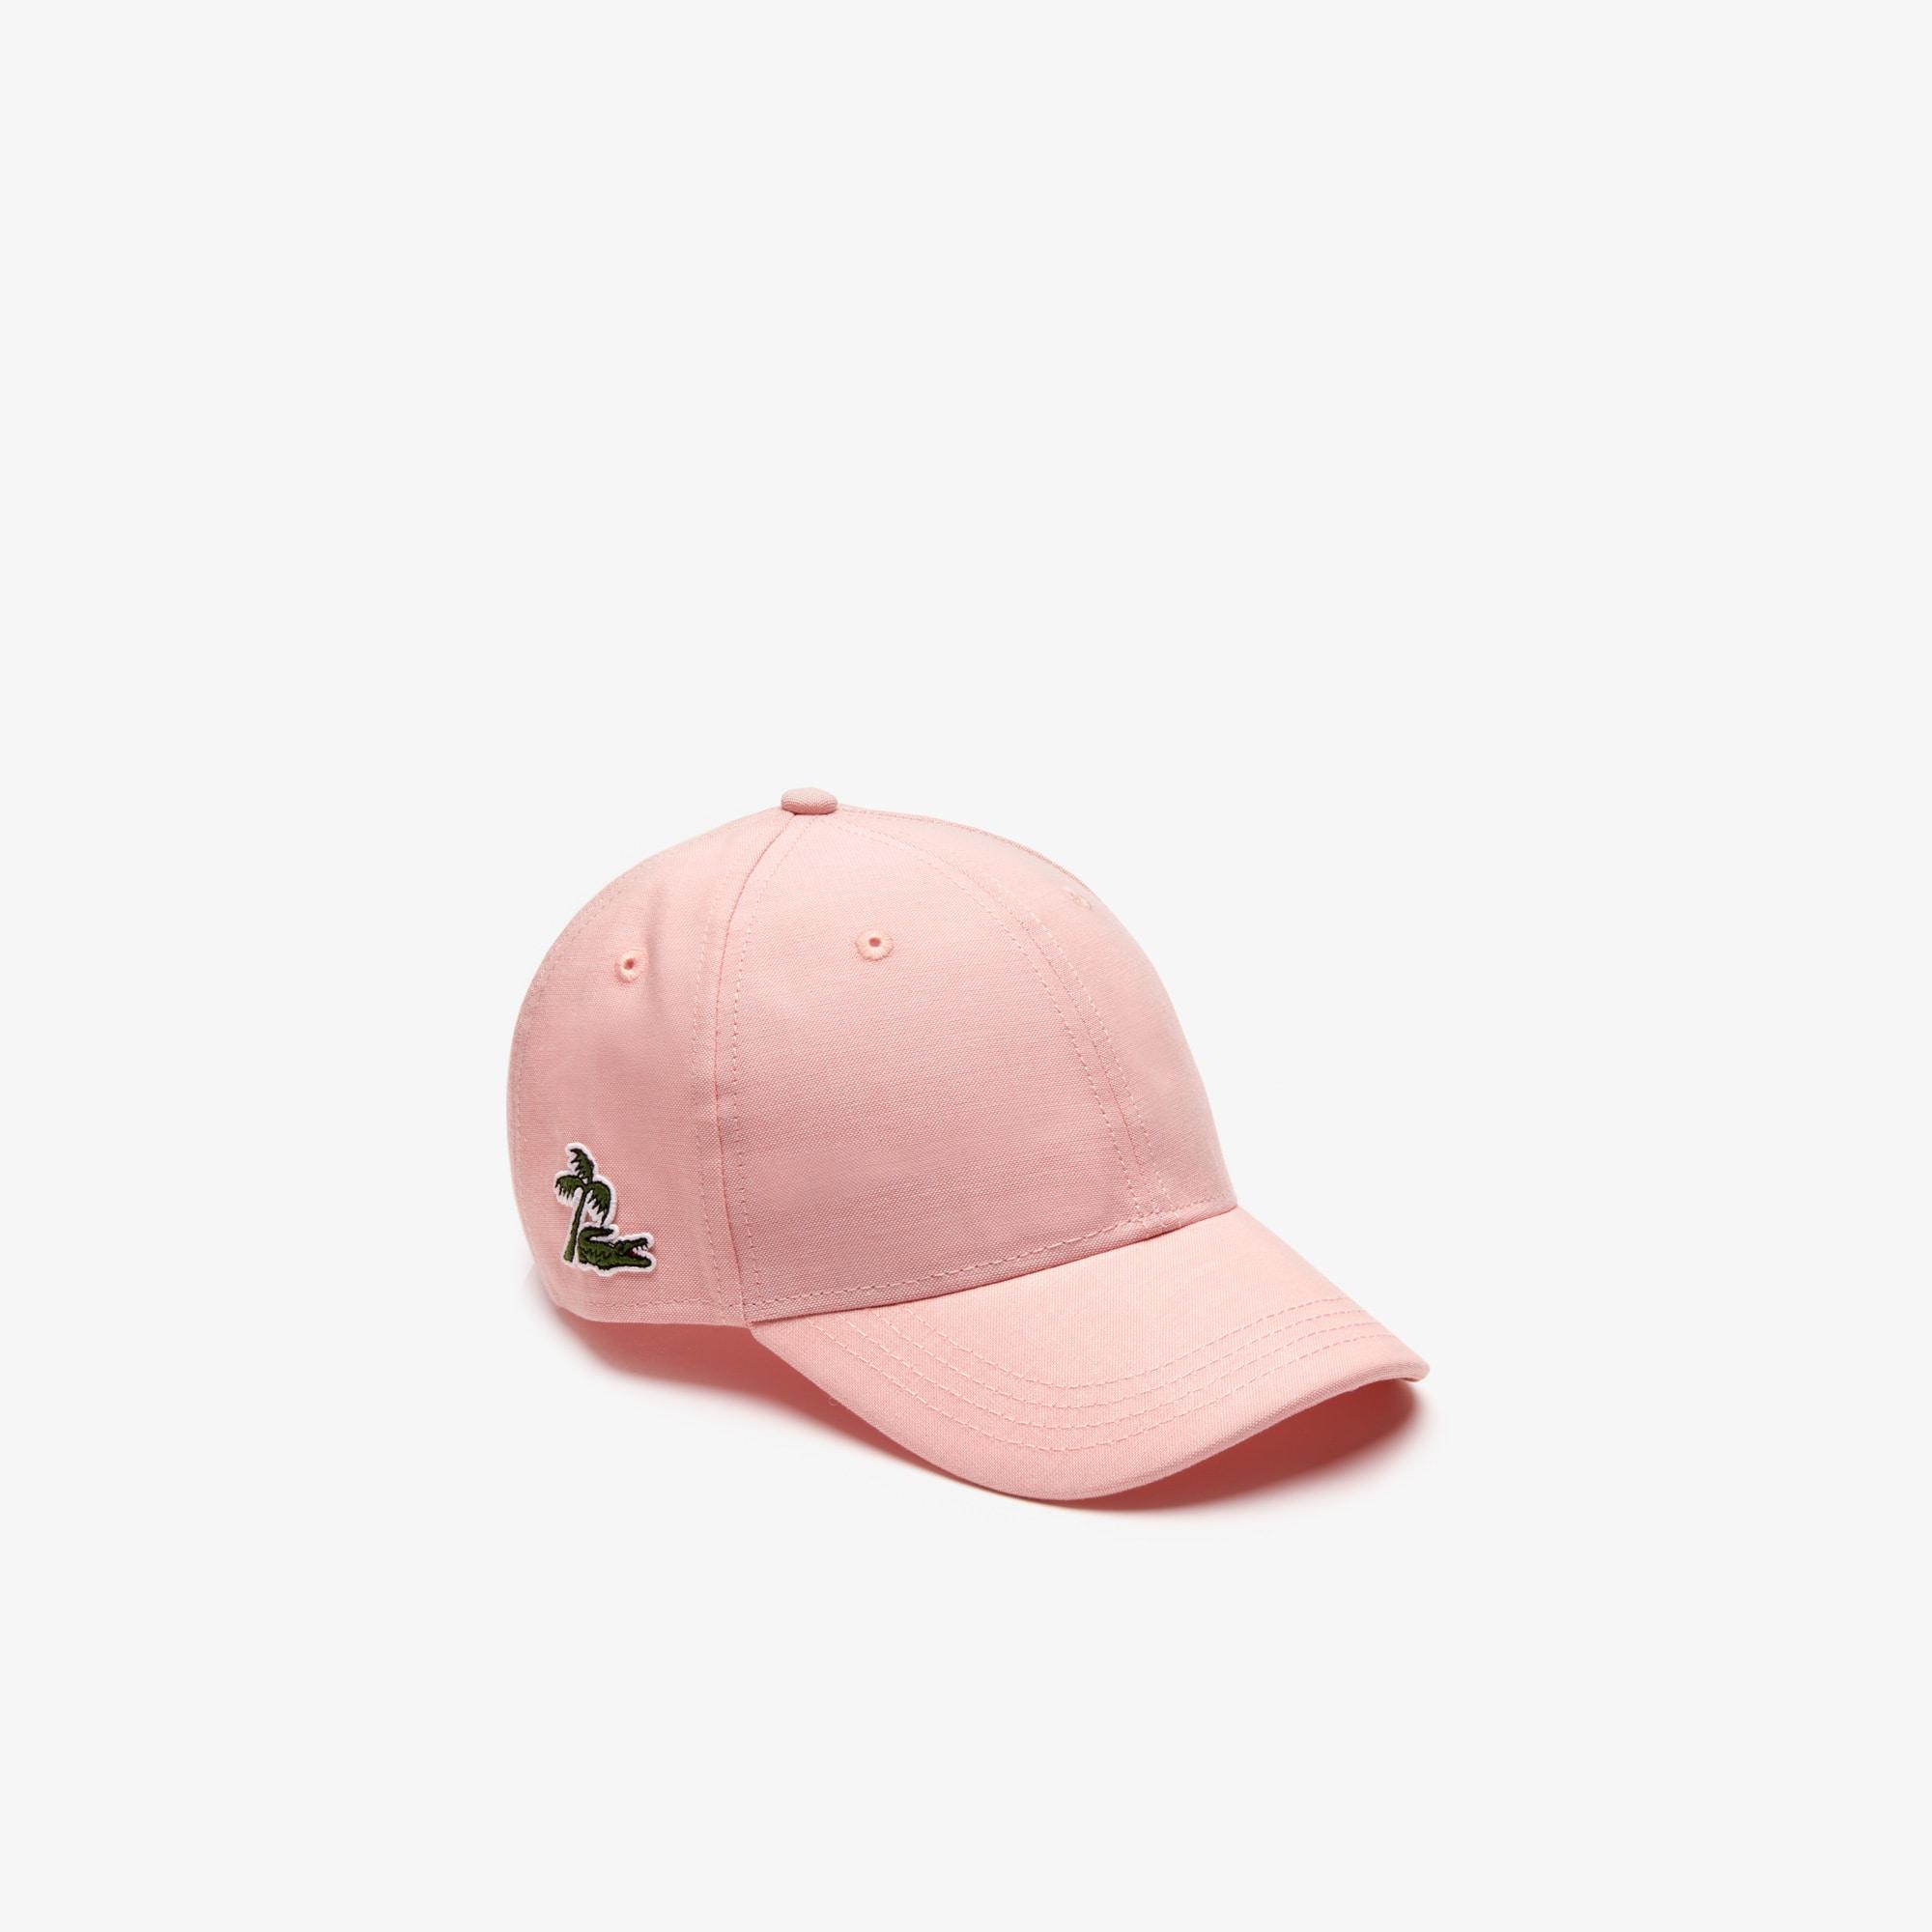 Women's Adjustable Cotton Cap